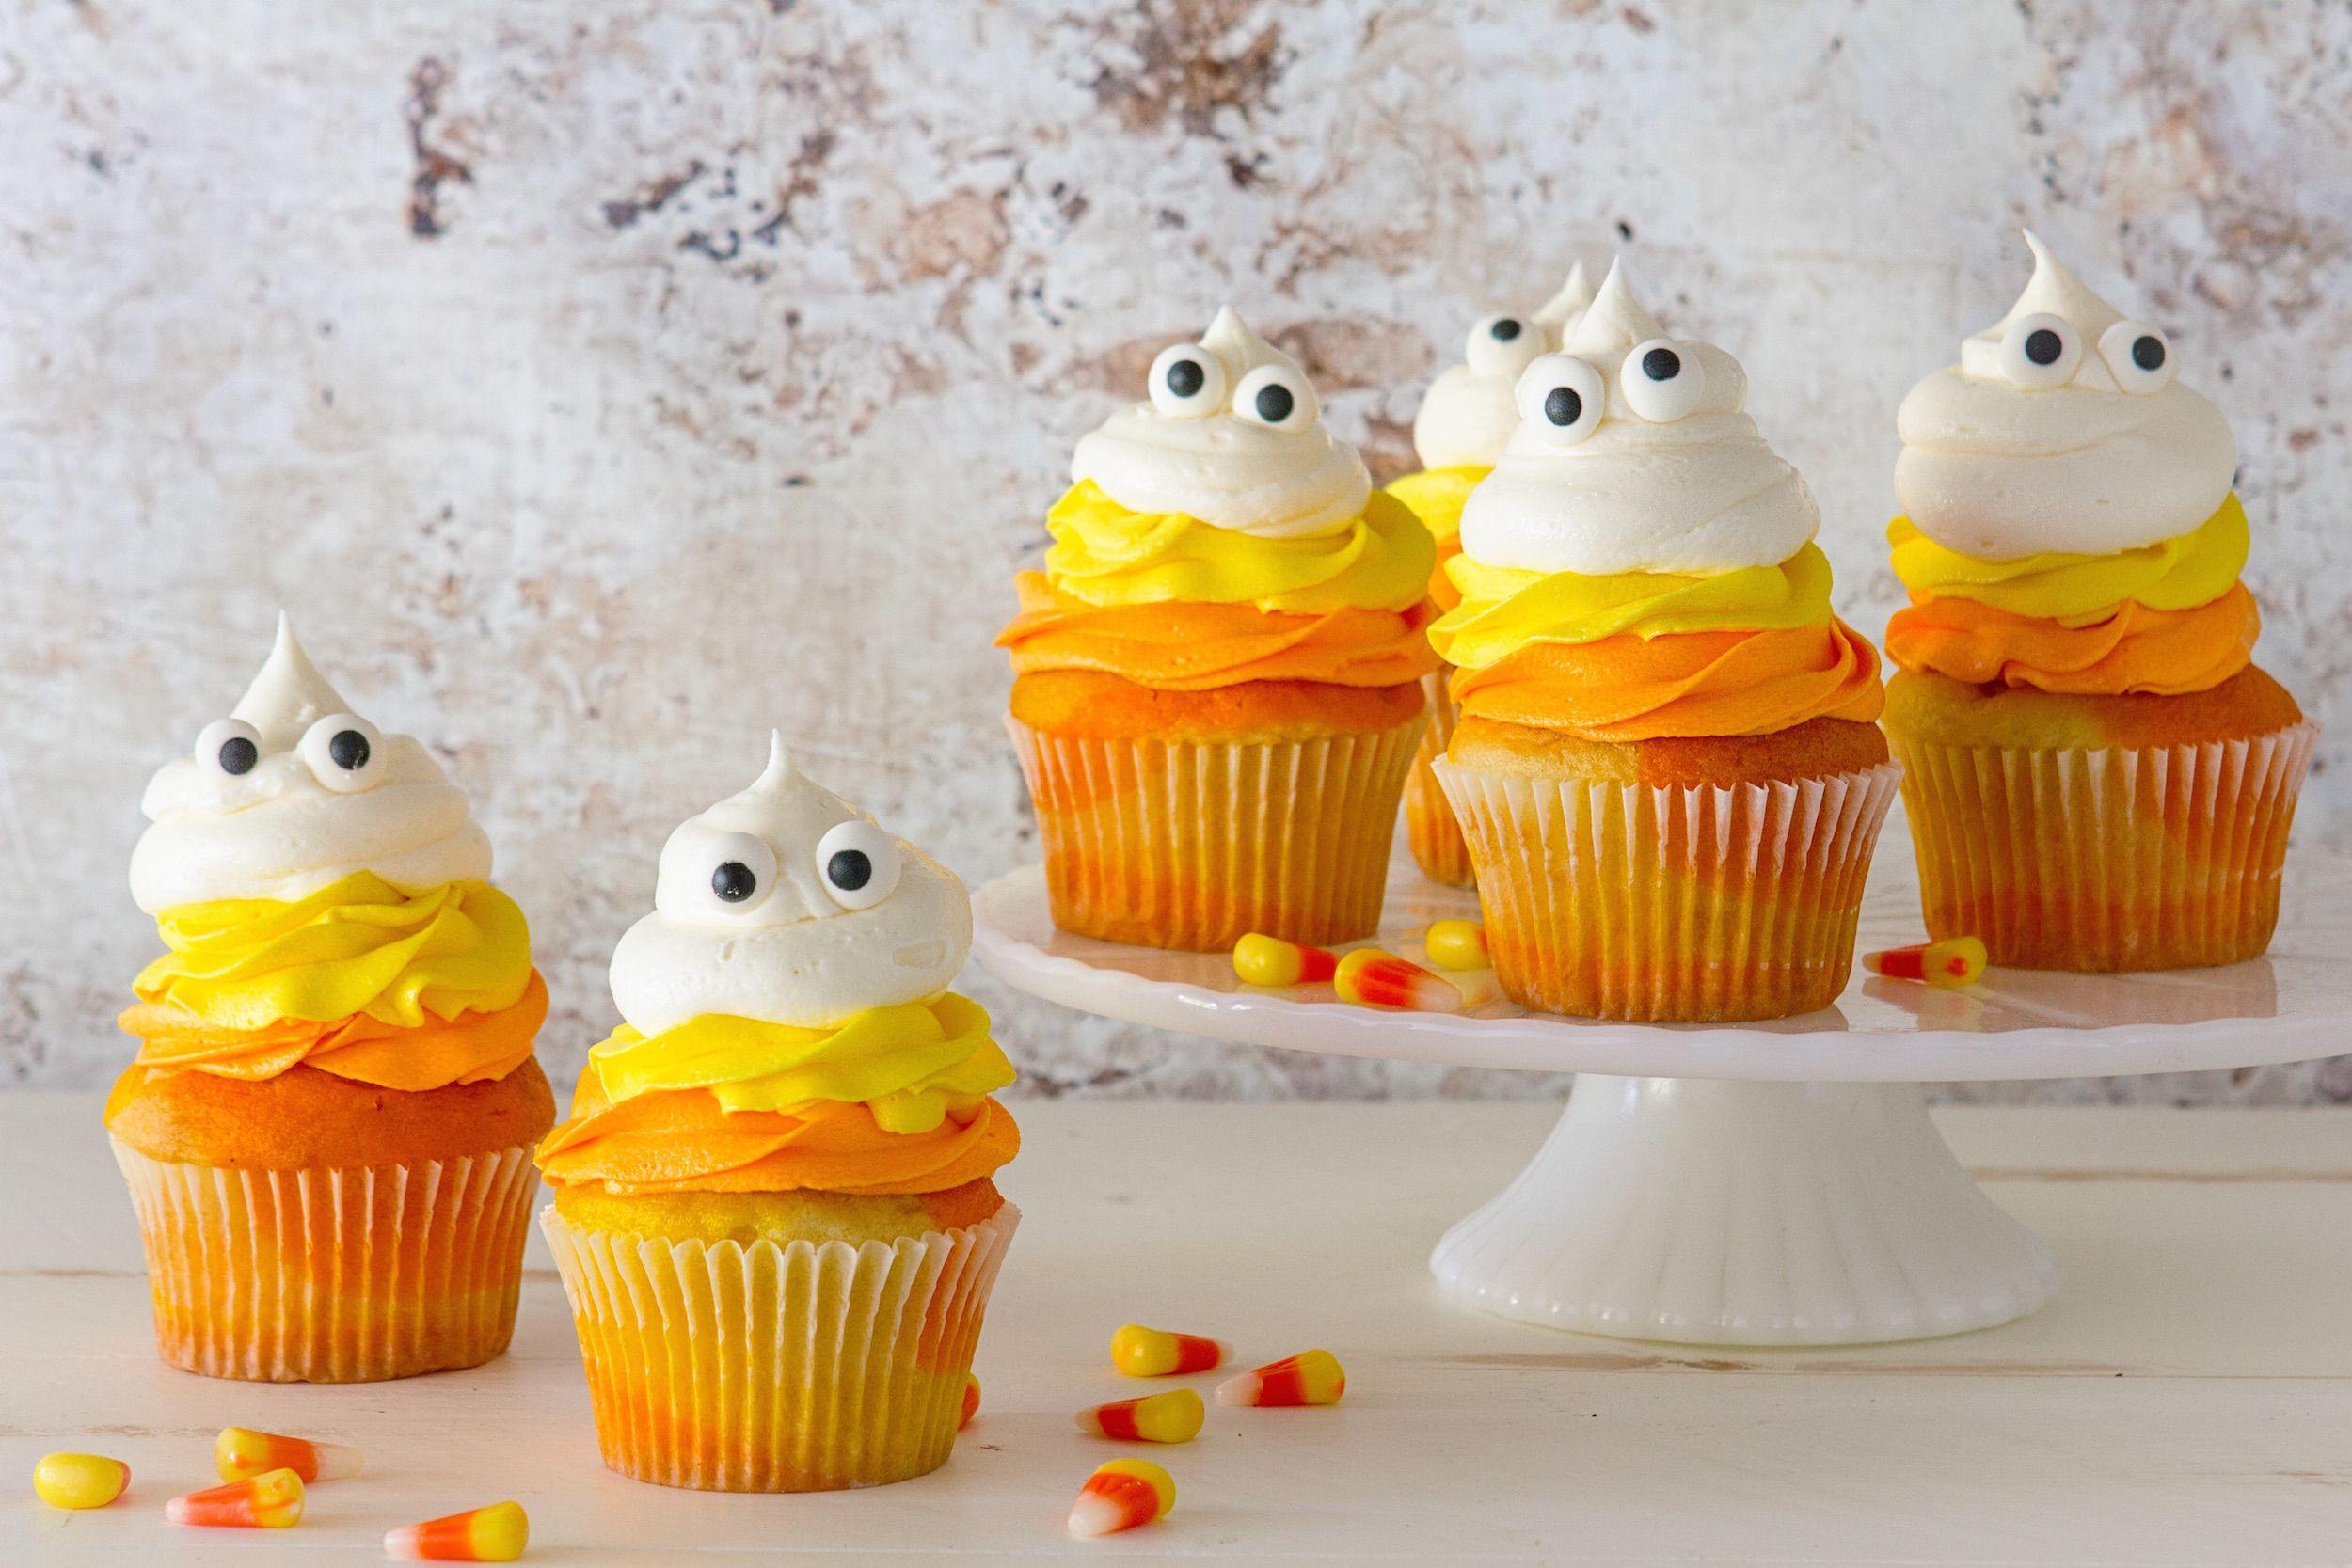 30 Easy Halloween Cupcake Ideas Recipes for Halloween